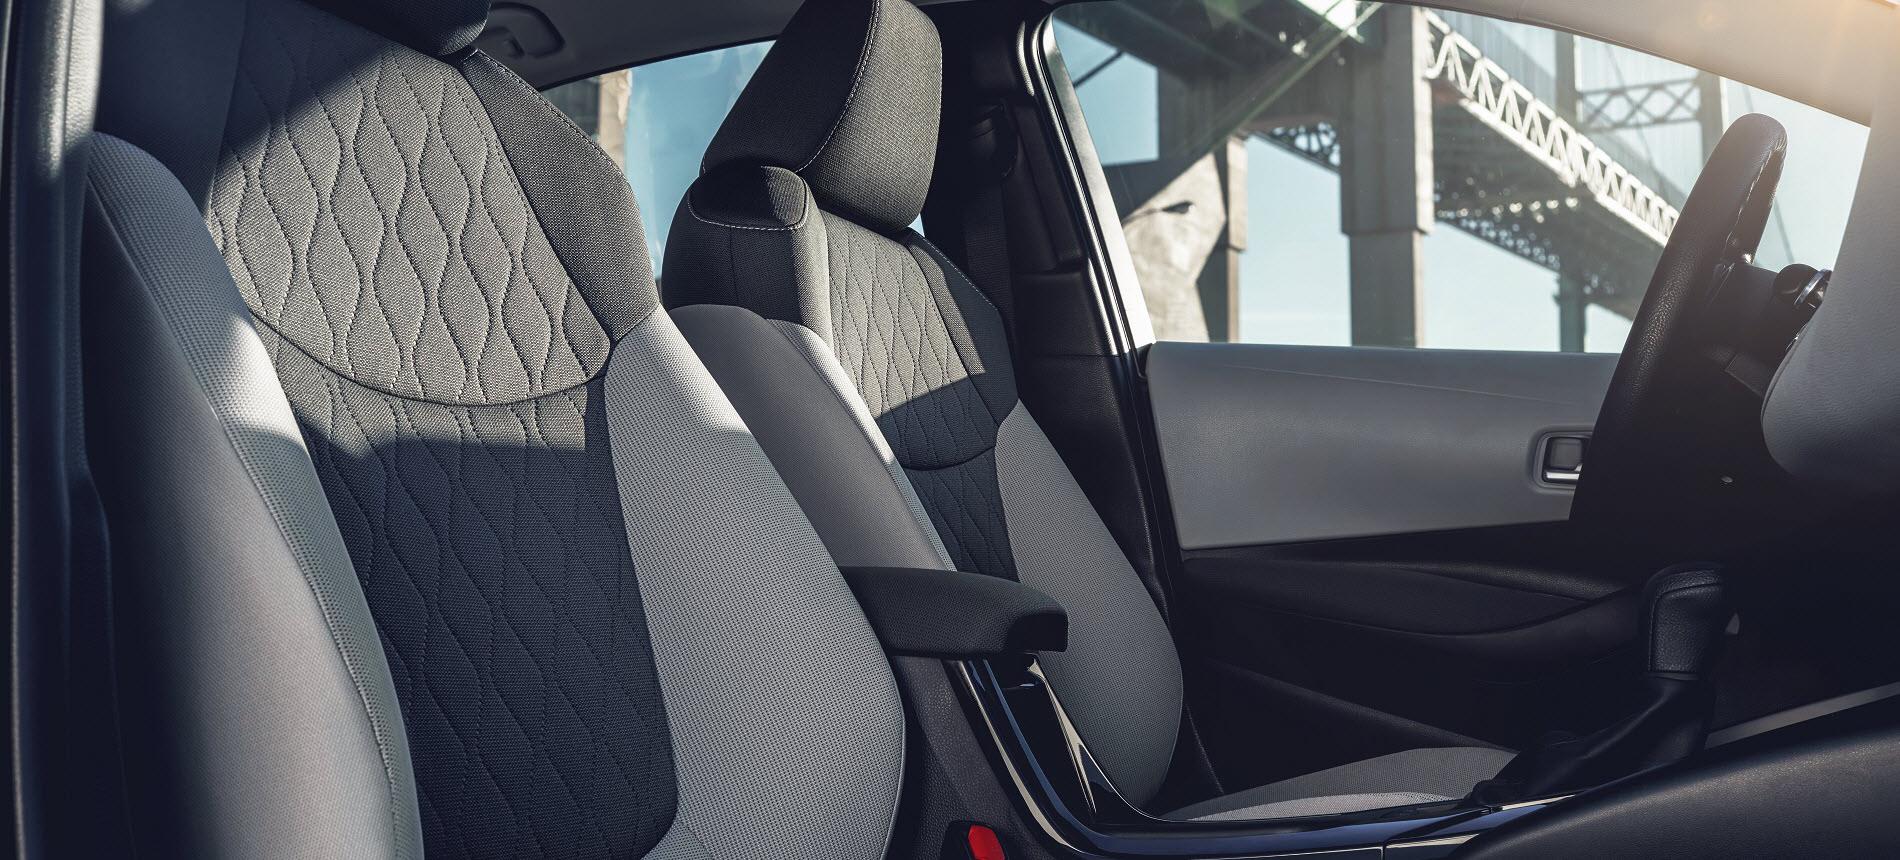 2021 Toyota Corolla Hybrid Interior Space